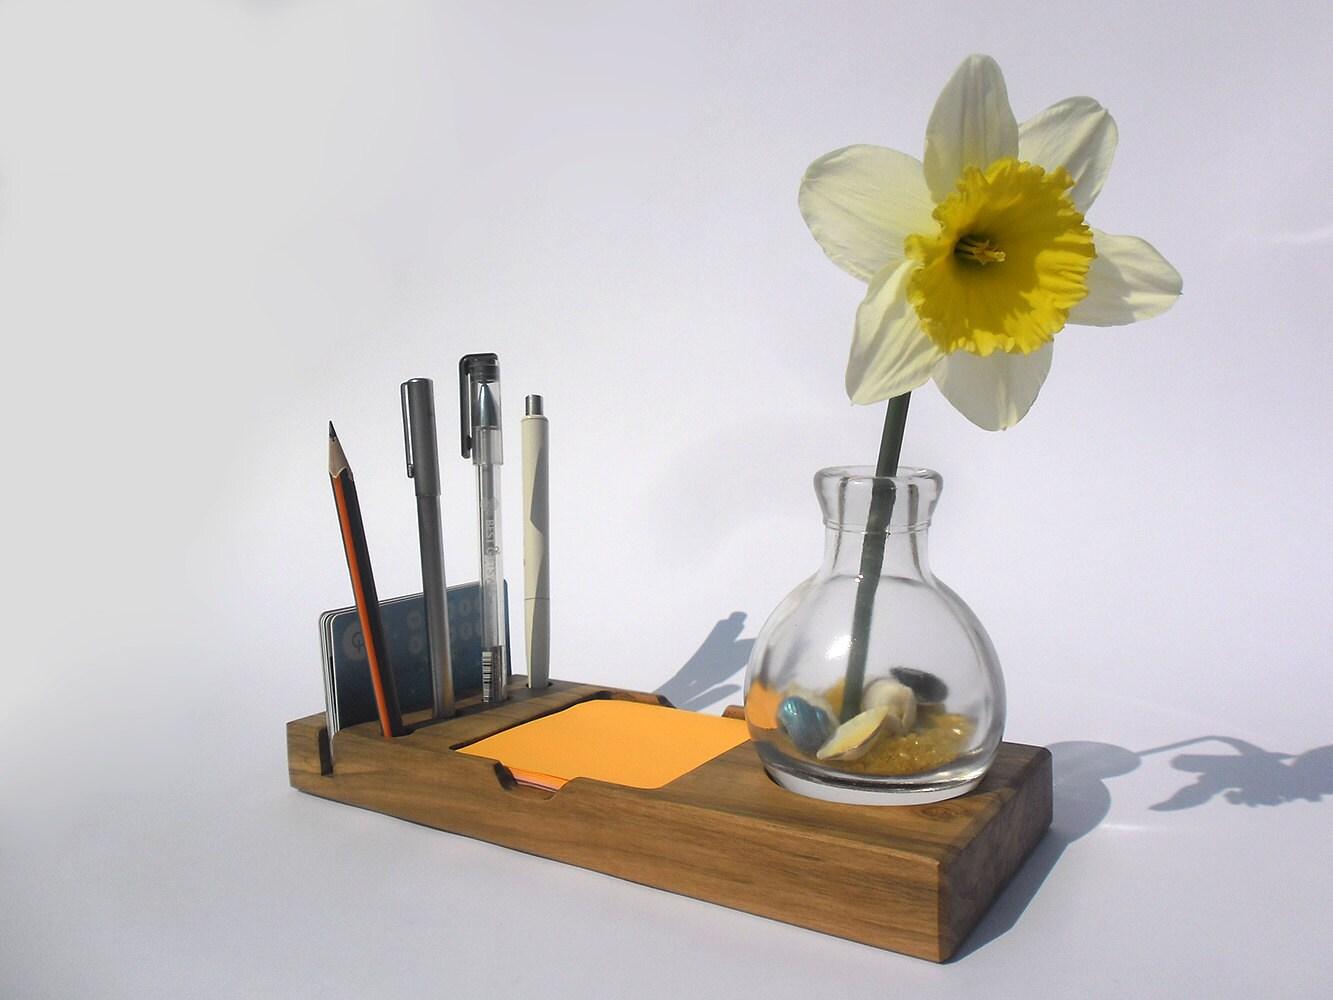 Desk organizer with glass vase wooden pen by - Glass desk organizer ...